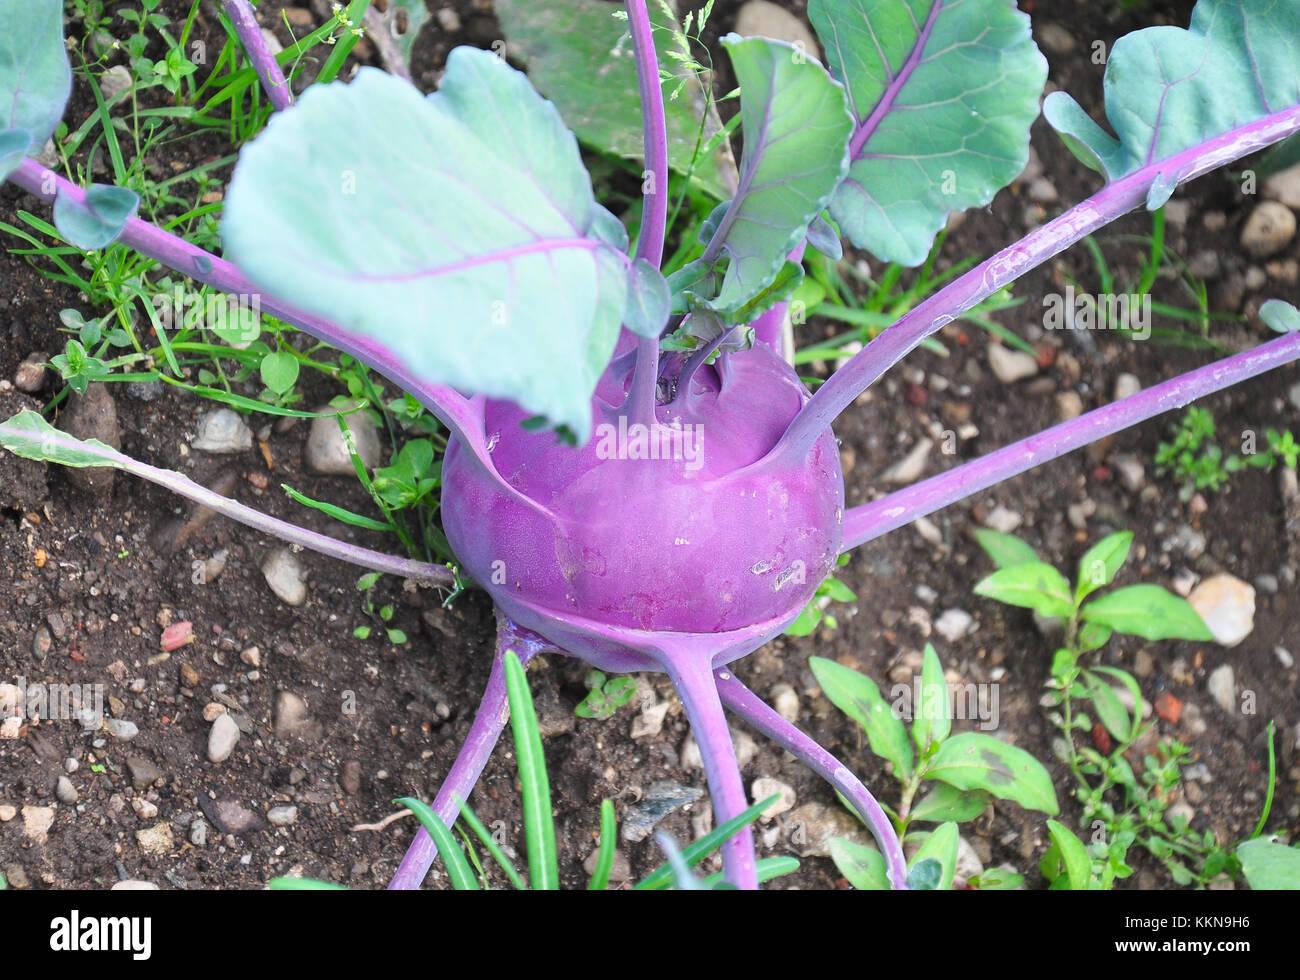 Kohlrabi plant